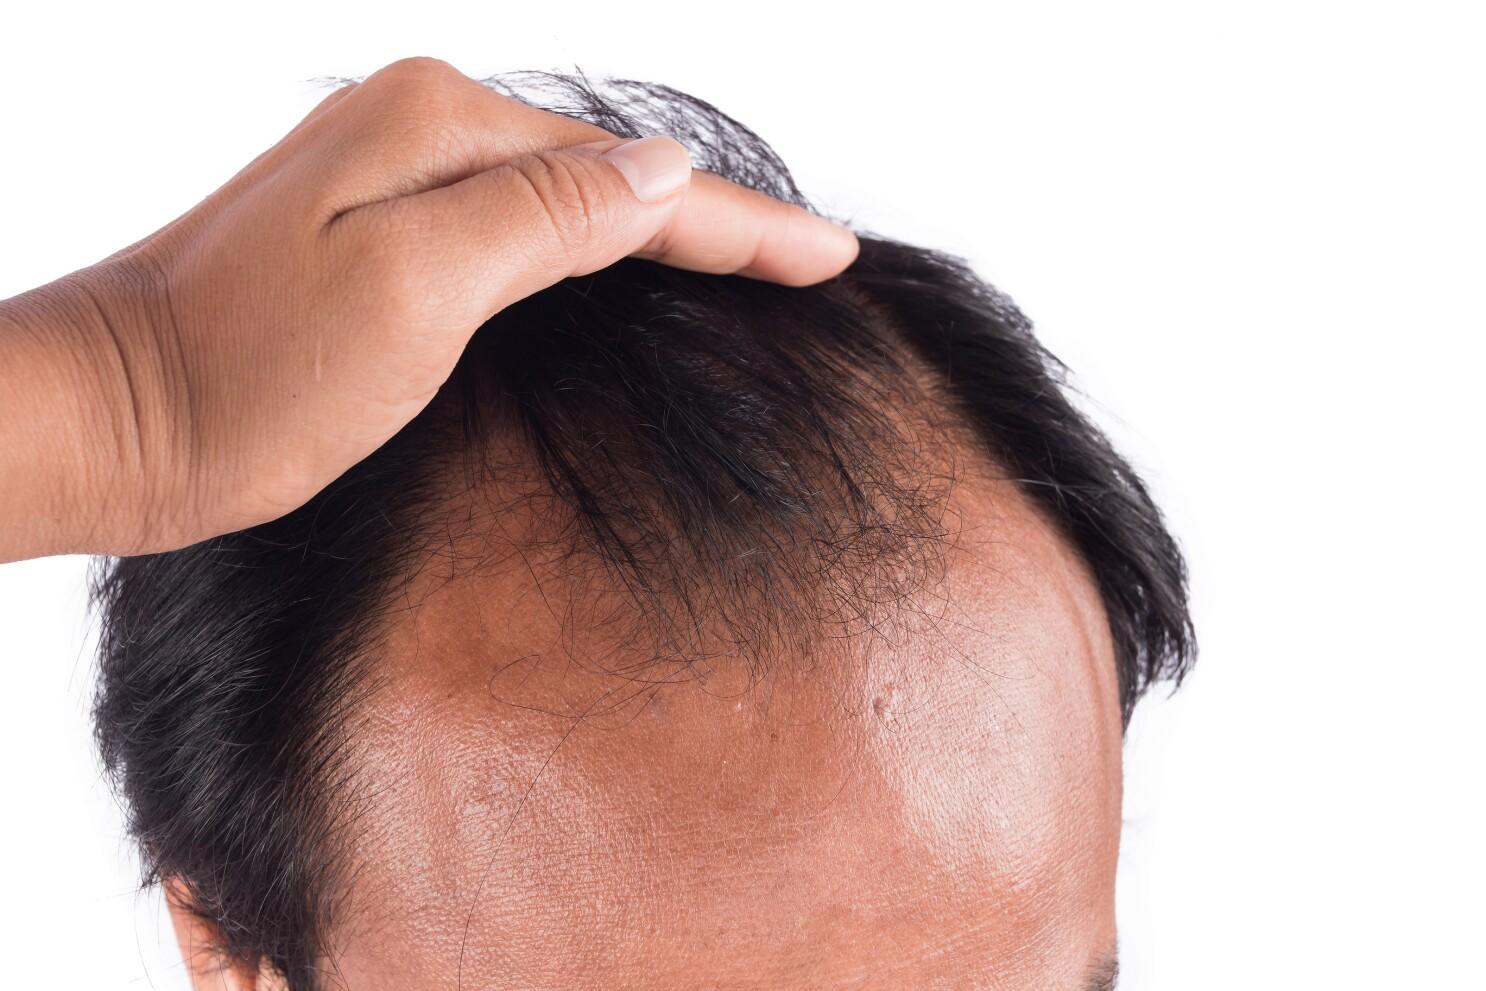 Patchy Success For Most Baldness Treatments The San Diego Union Tribune